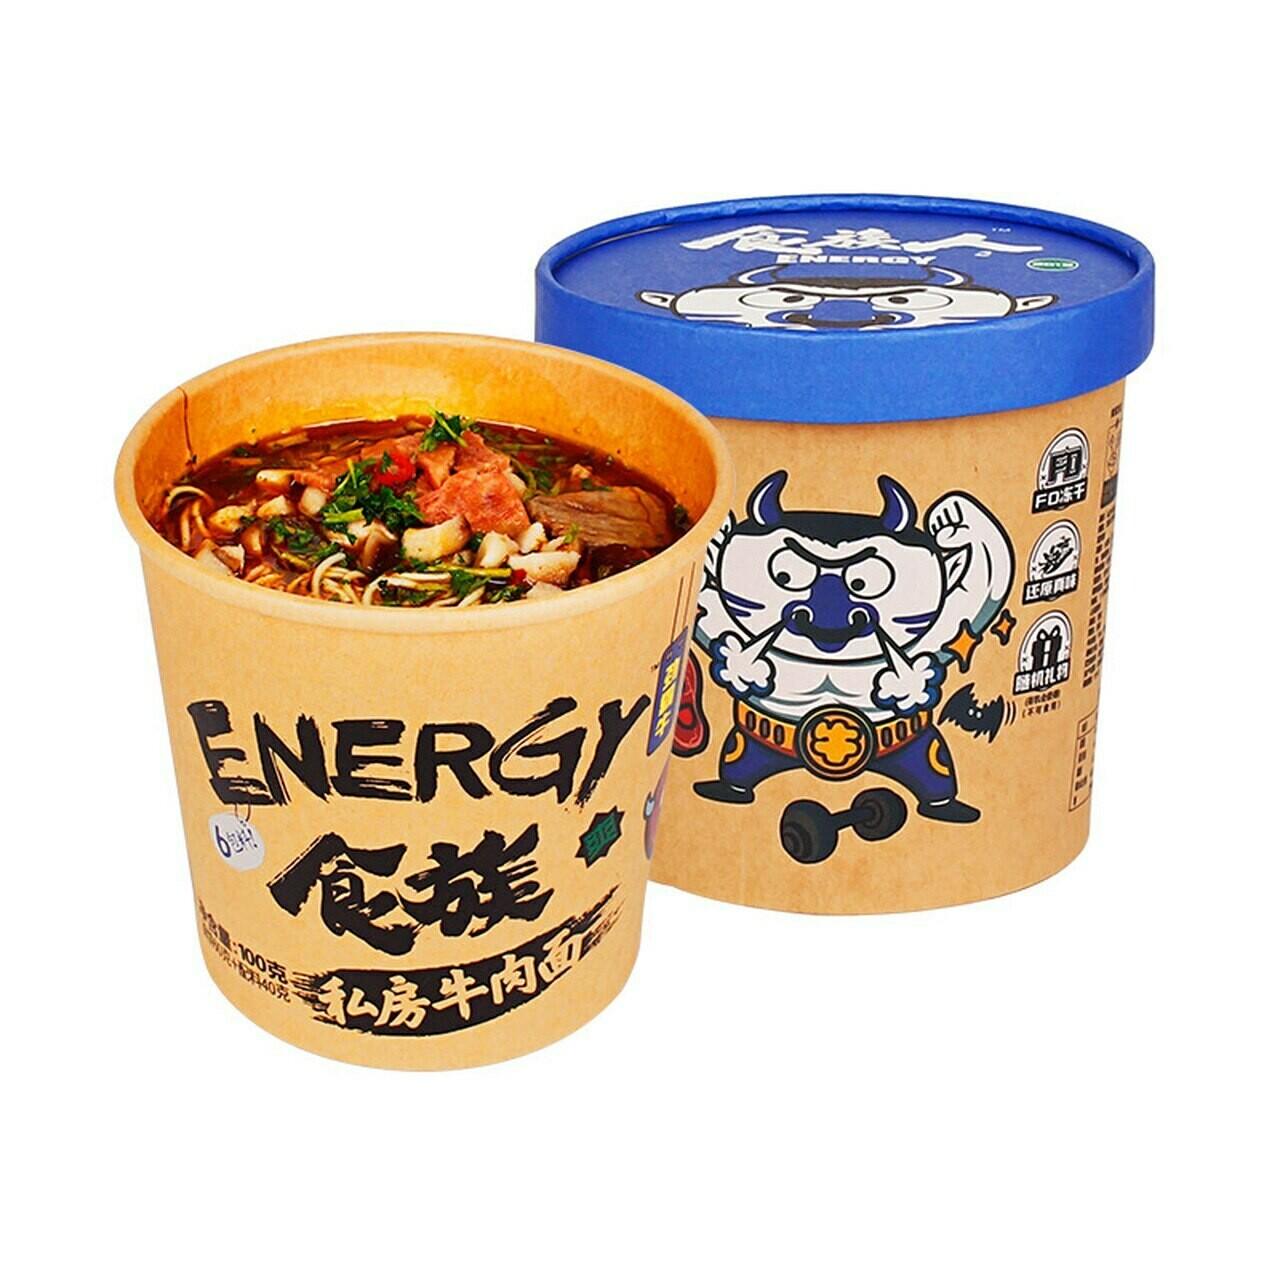 SHIZUREN ARTIFICIAL BEEF FLAVOR NOODLES 食族人 私房牛肉面(100G)